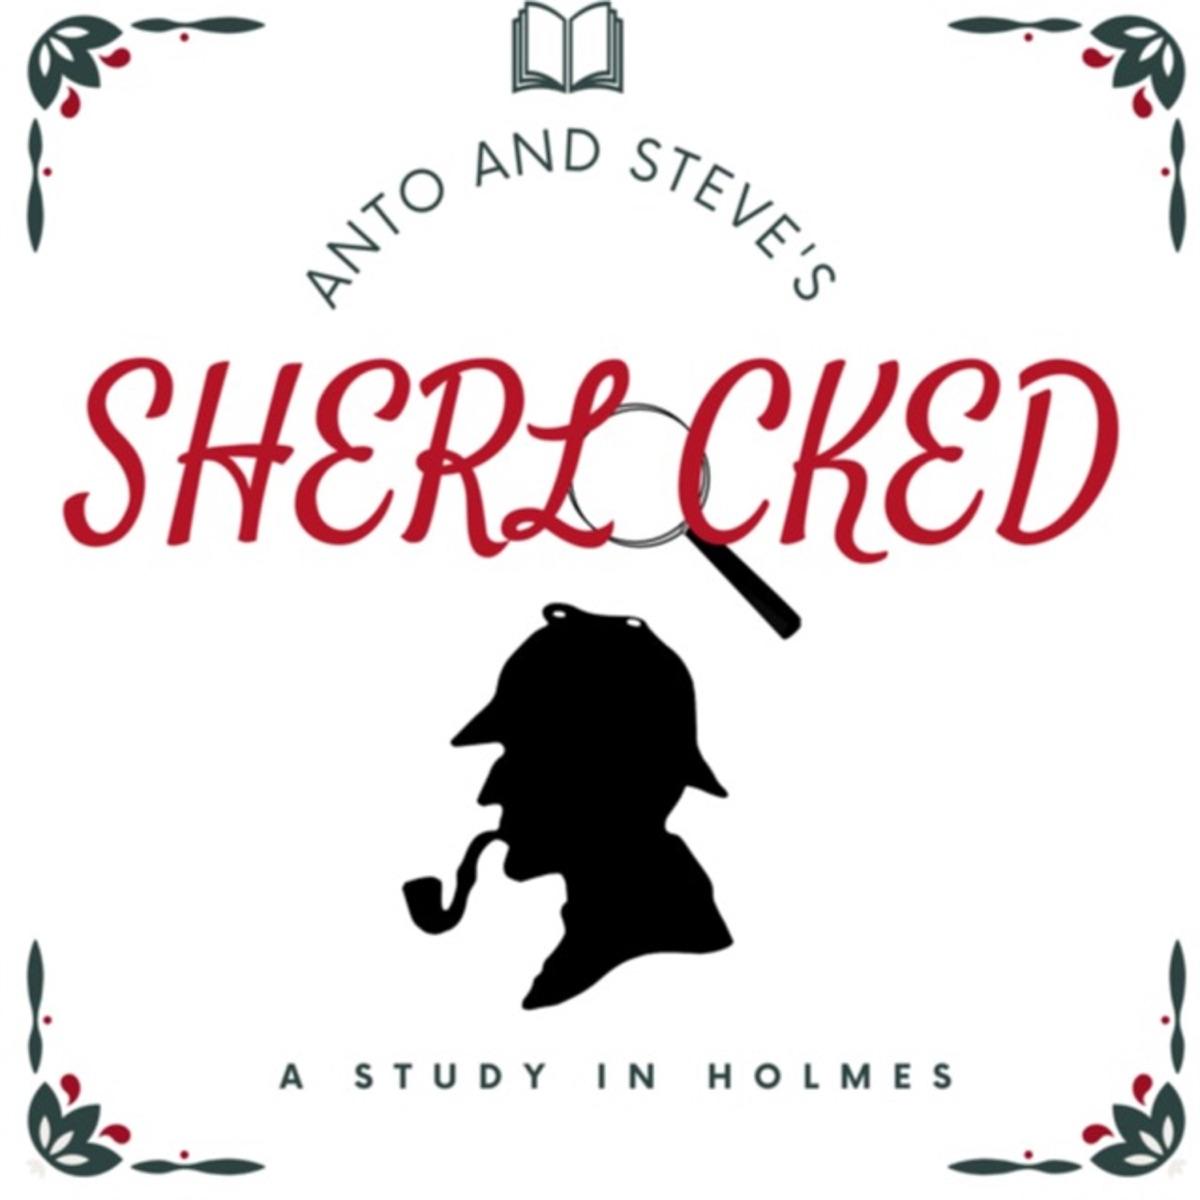 The Sherlocked Podcast